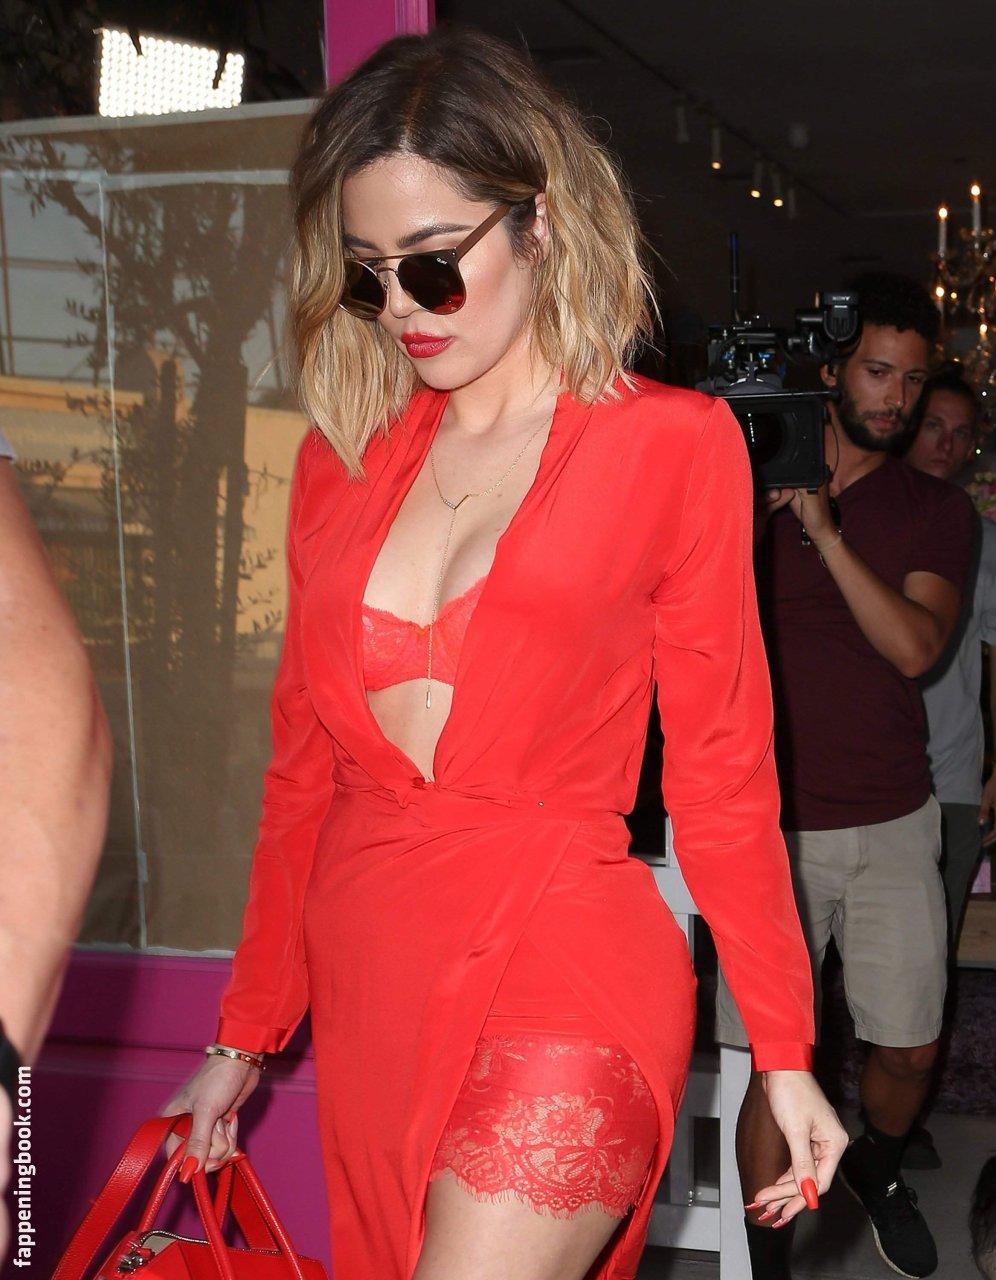 Khloe Kardashian Nude The Fappening - Page 3 - FappeningGram